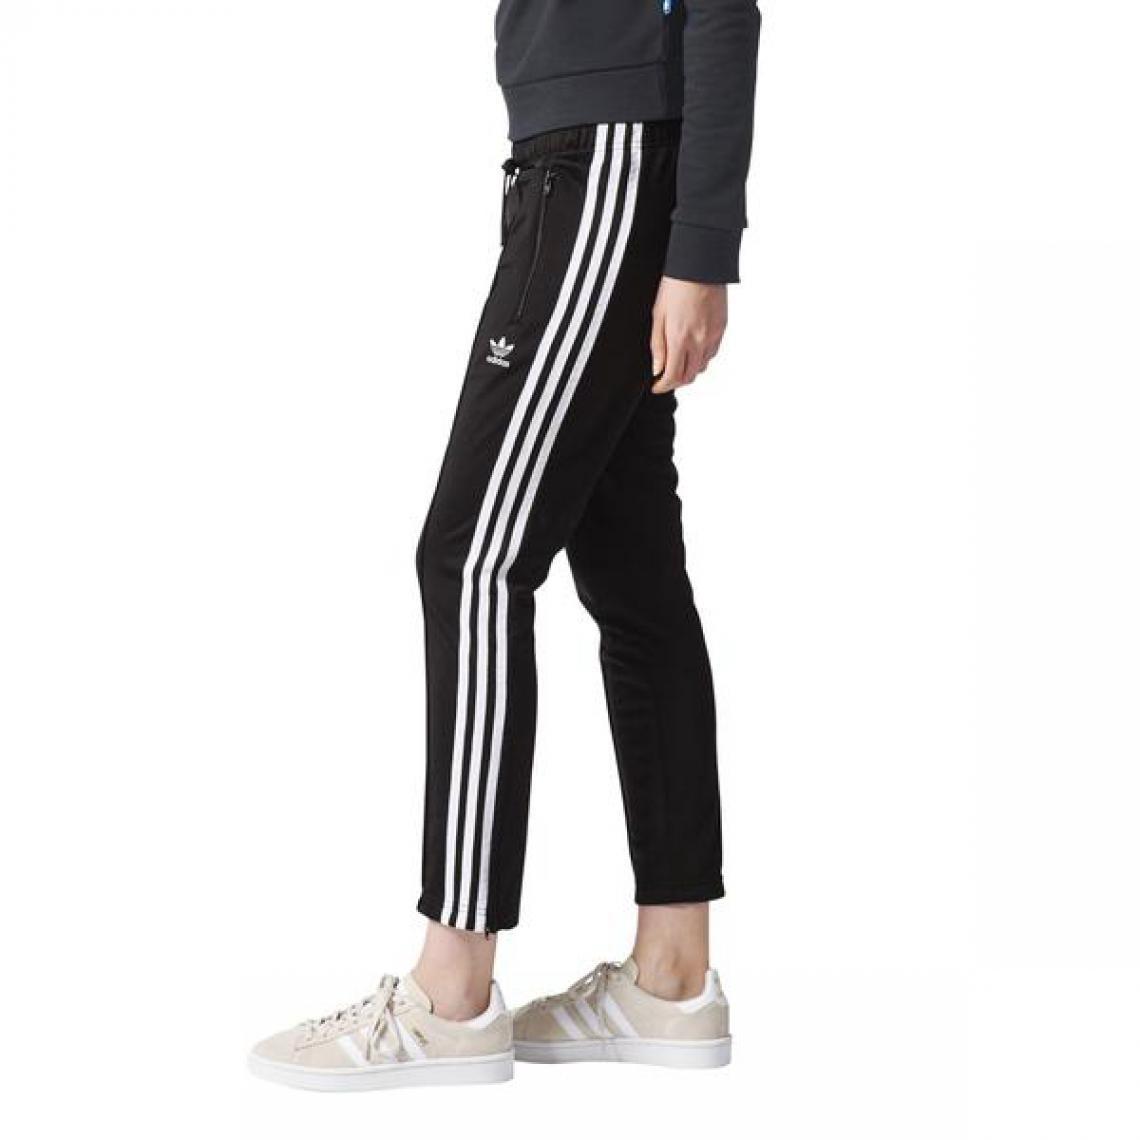 Pantalon jogging 3 bandes Adidas Originals femme - Noir | 3 ...